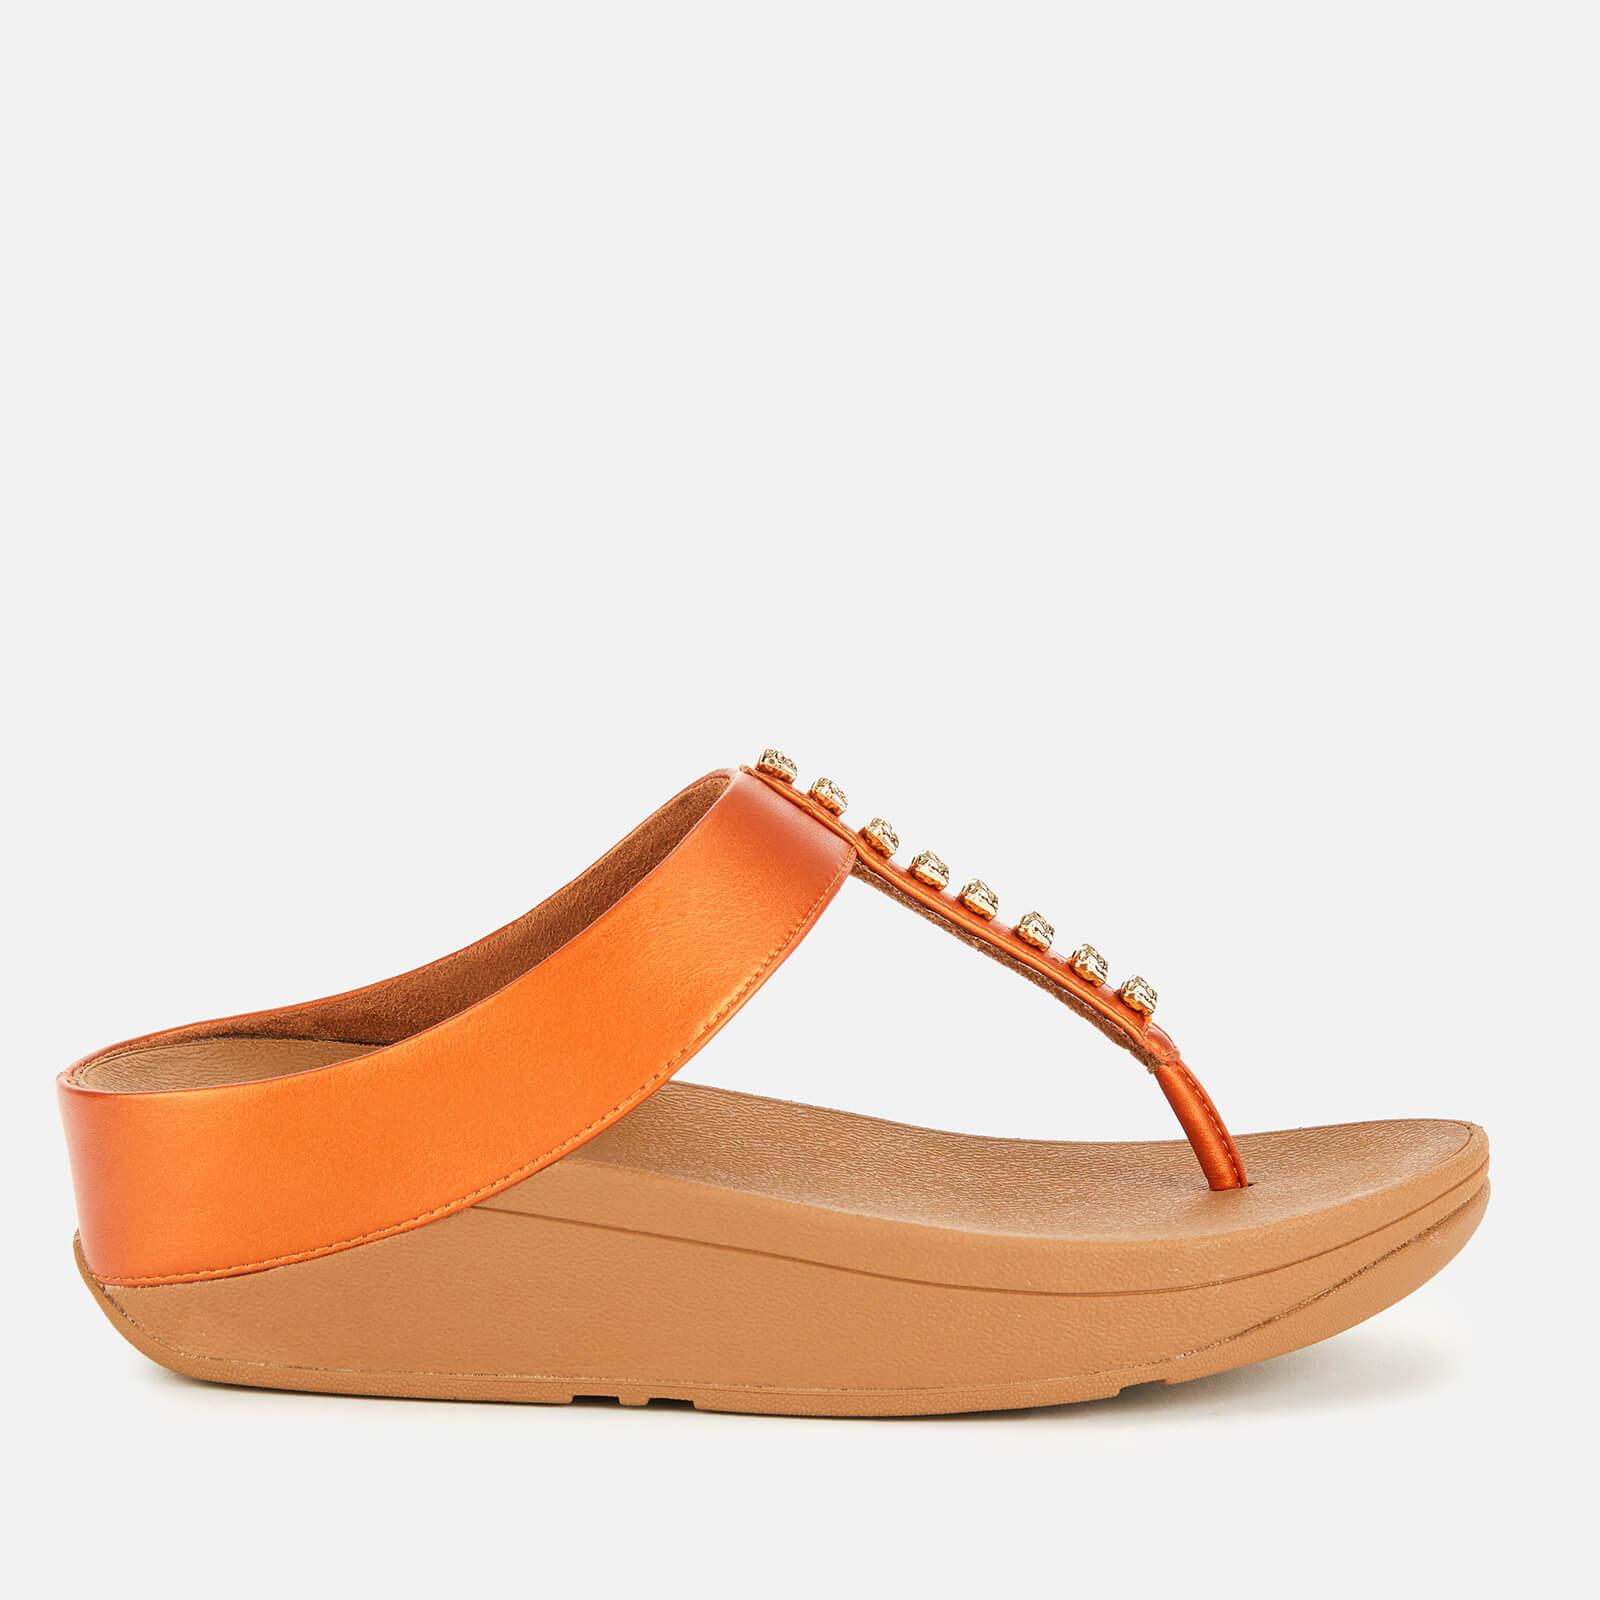 1e45a6352 FitFlop Women s Fino Treasure Toe Post Sandals - Amber Ash Womens Footwear